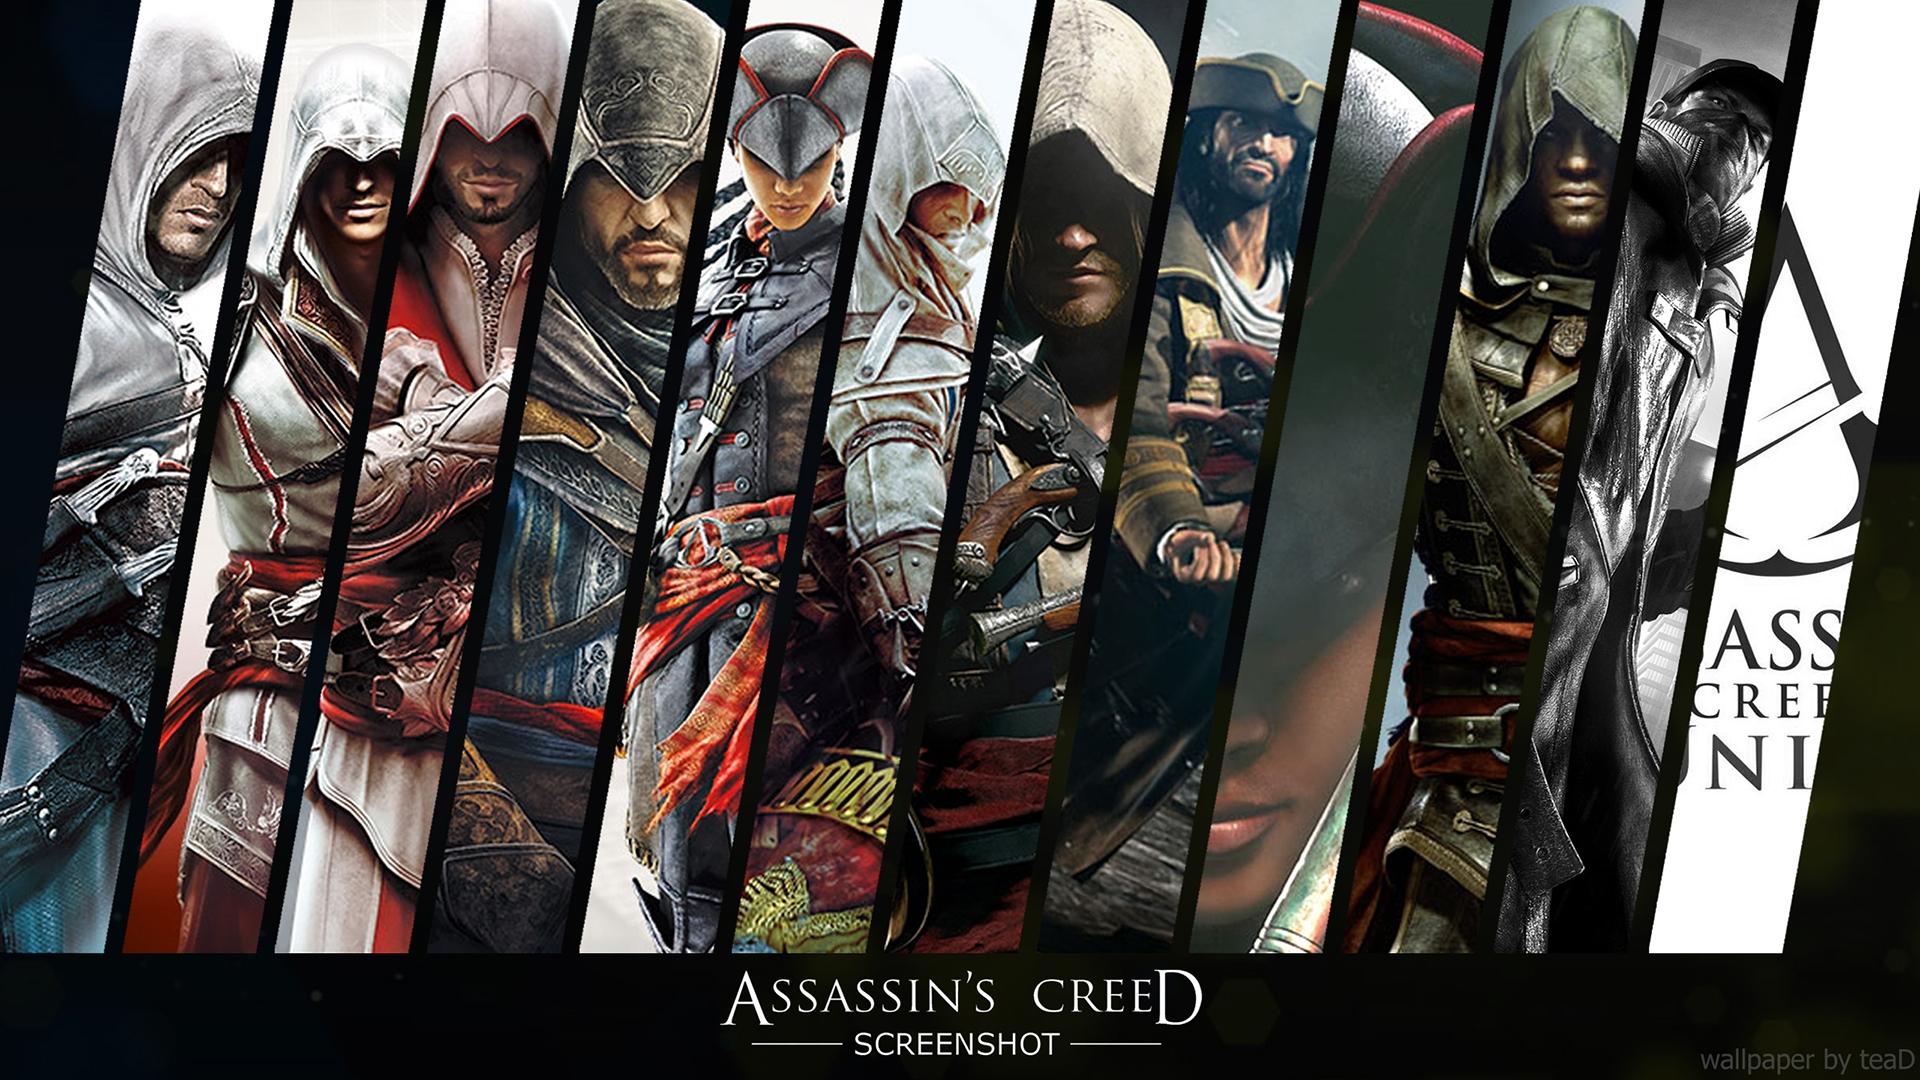 Free Download Wallpaper Assassins Creed Wallpaper 1920x1080 71370